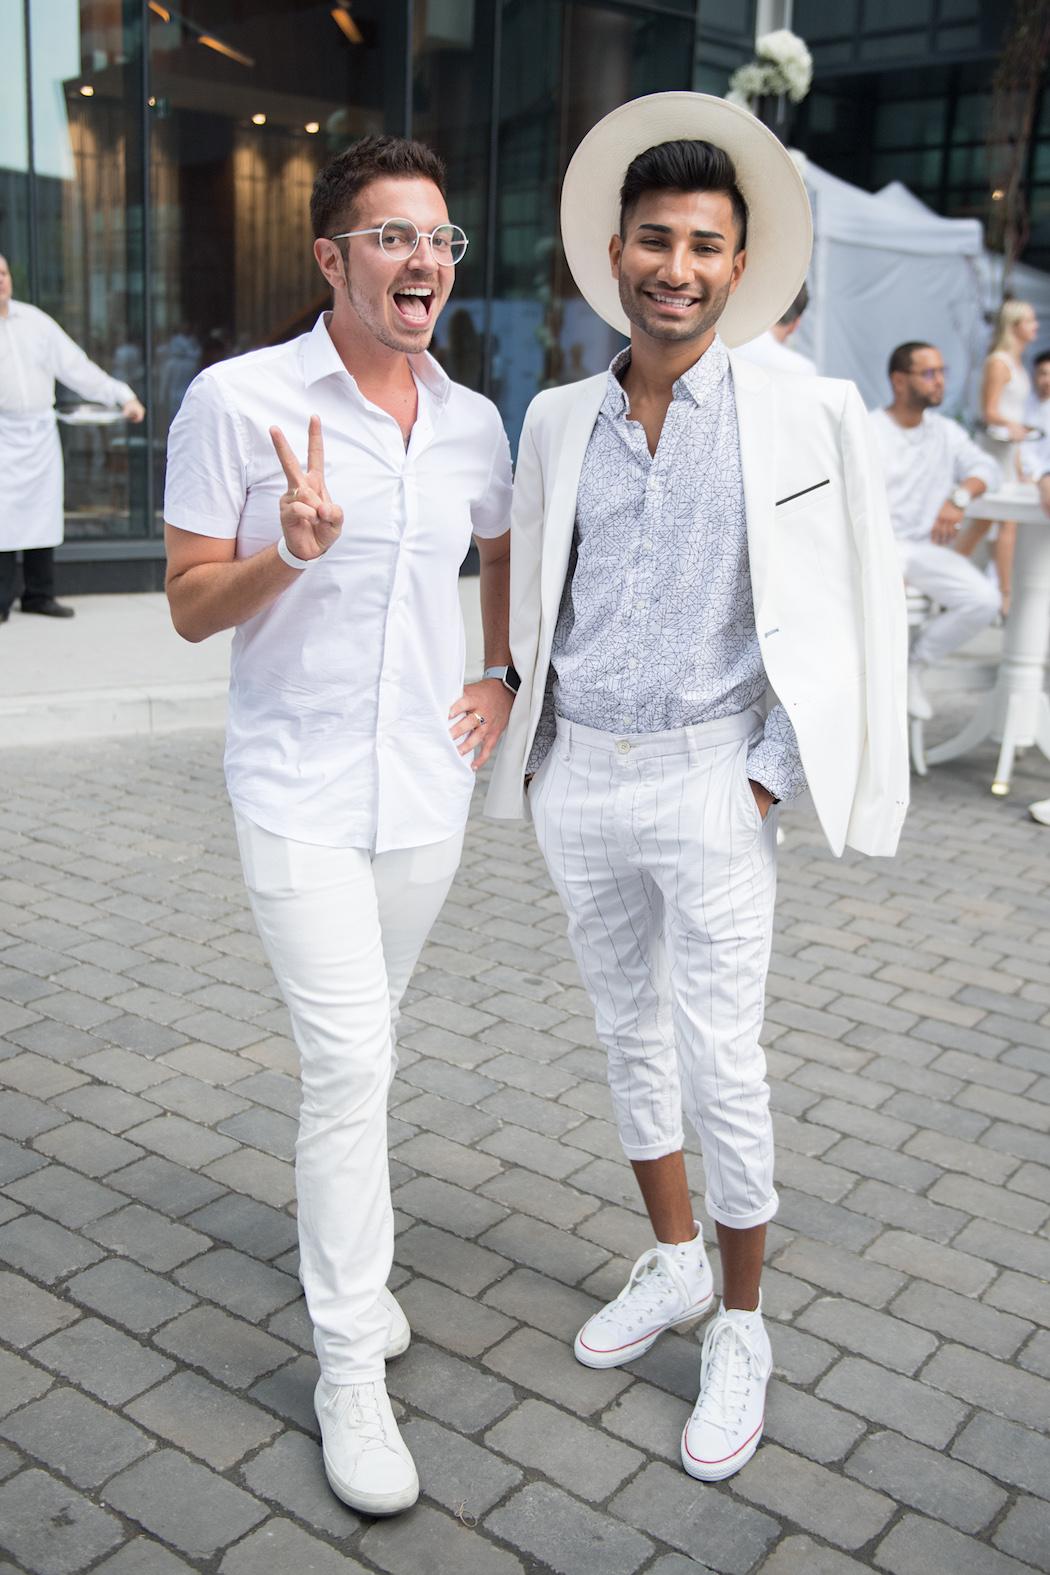 Daniel Reyes - DotheDaniel - Do the Daniel - Diner en Blanc Toronto 2018   View the VIBE Toronto